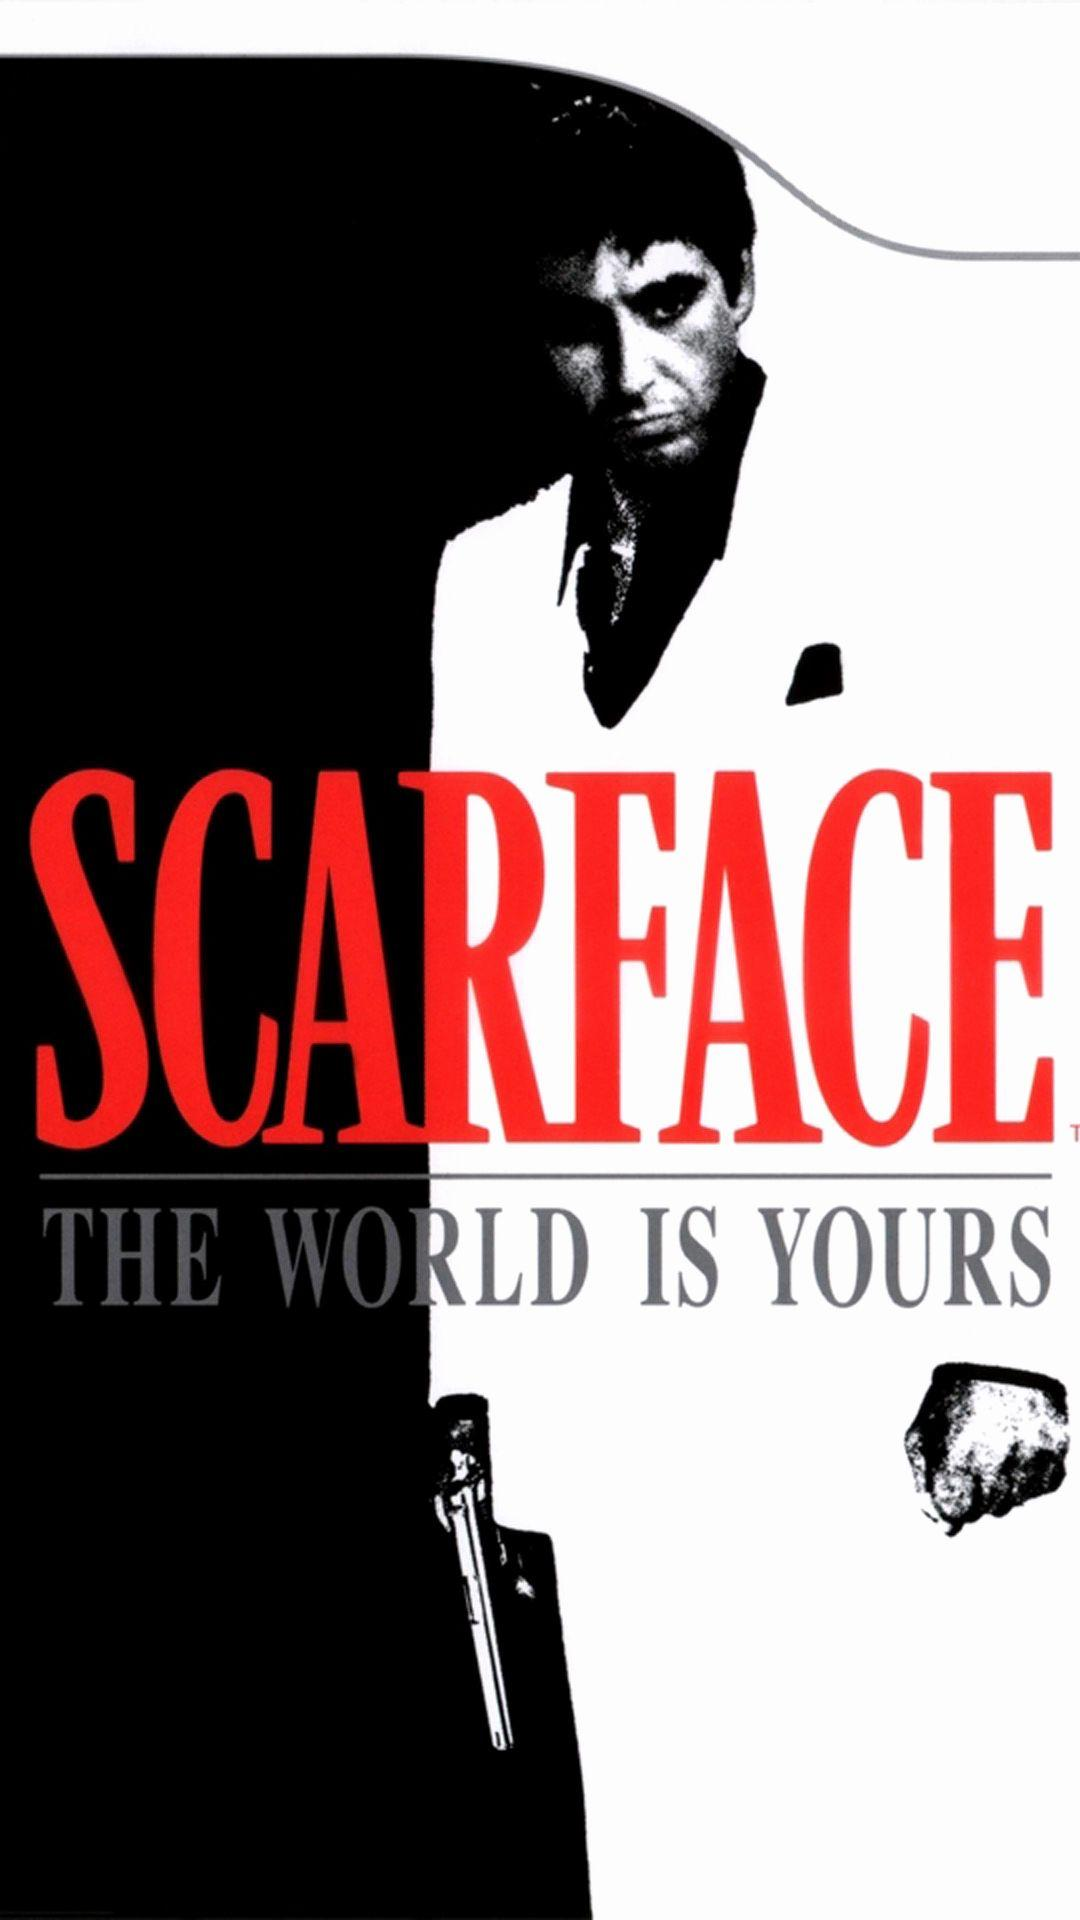 Scarface Wallpaper Inspirational Hd IPhone 6 Plus